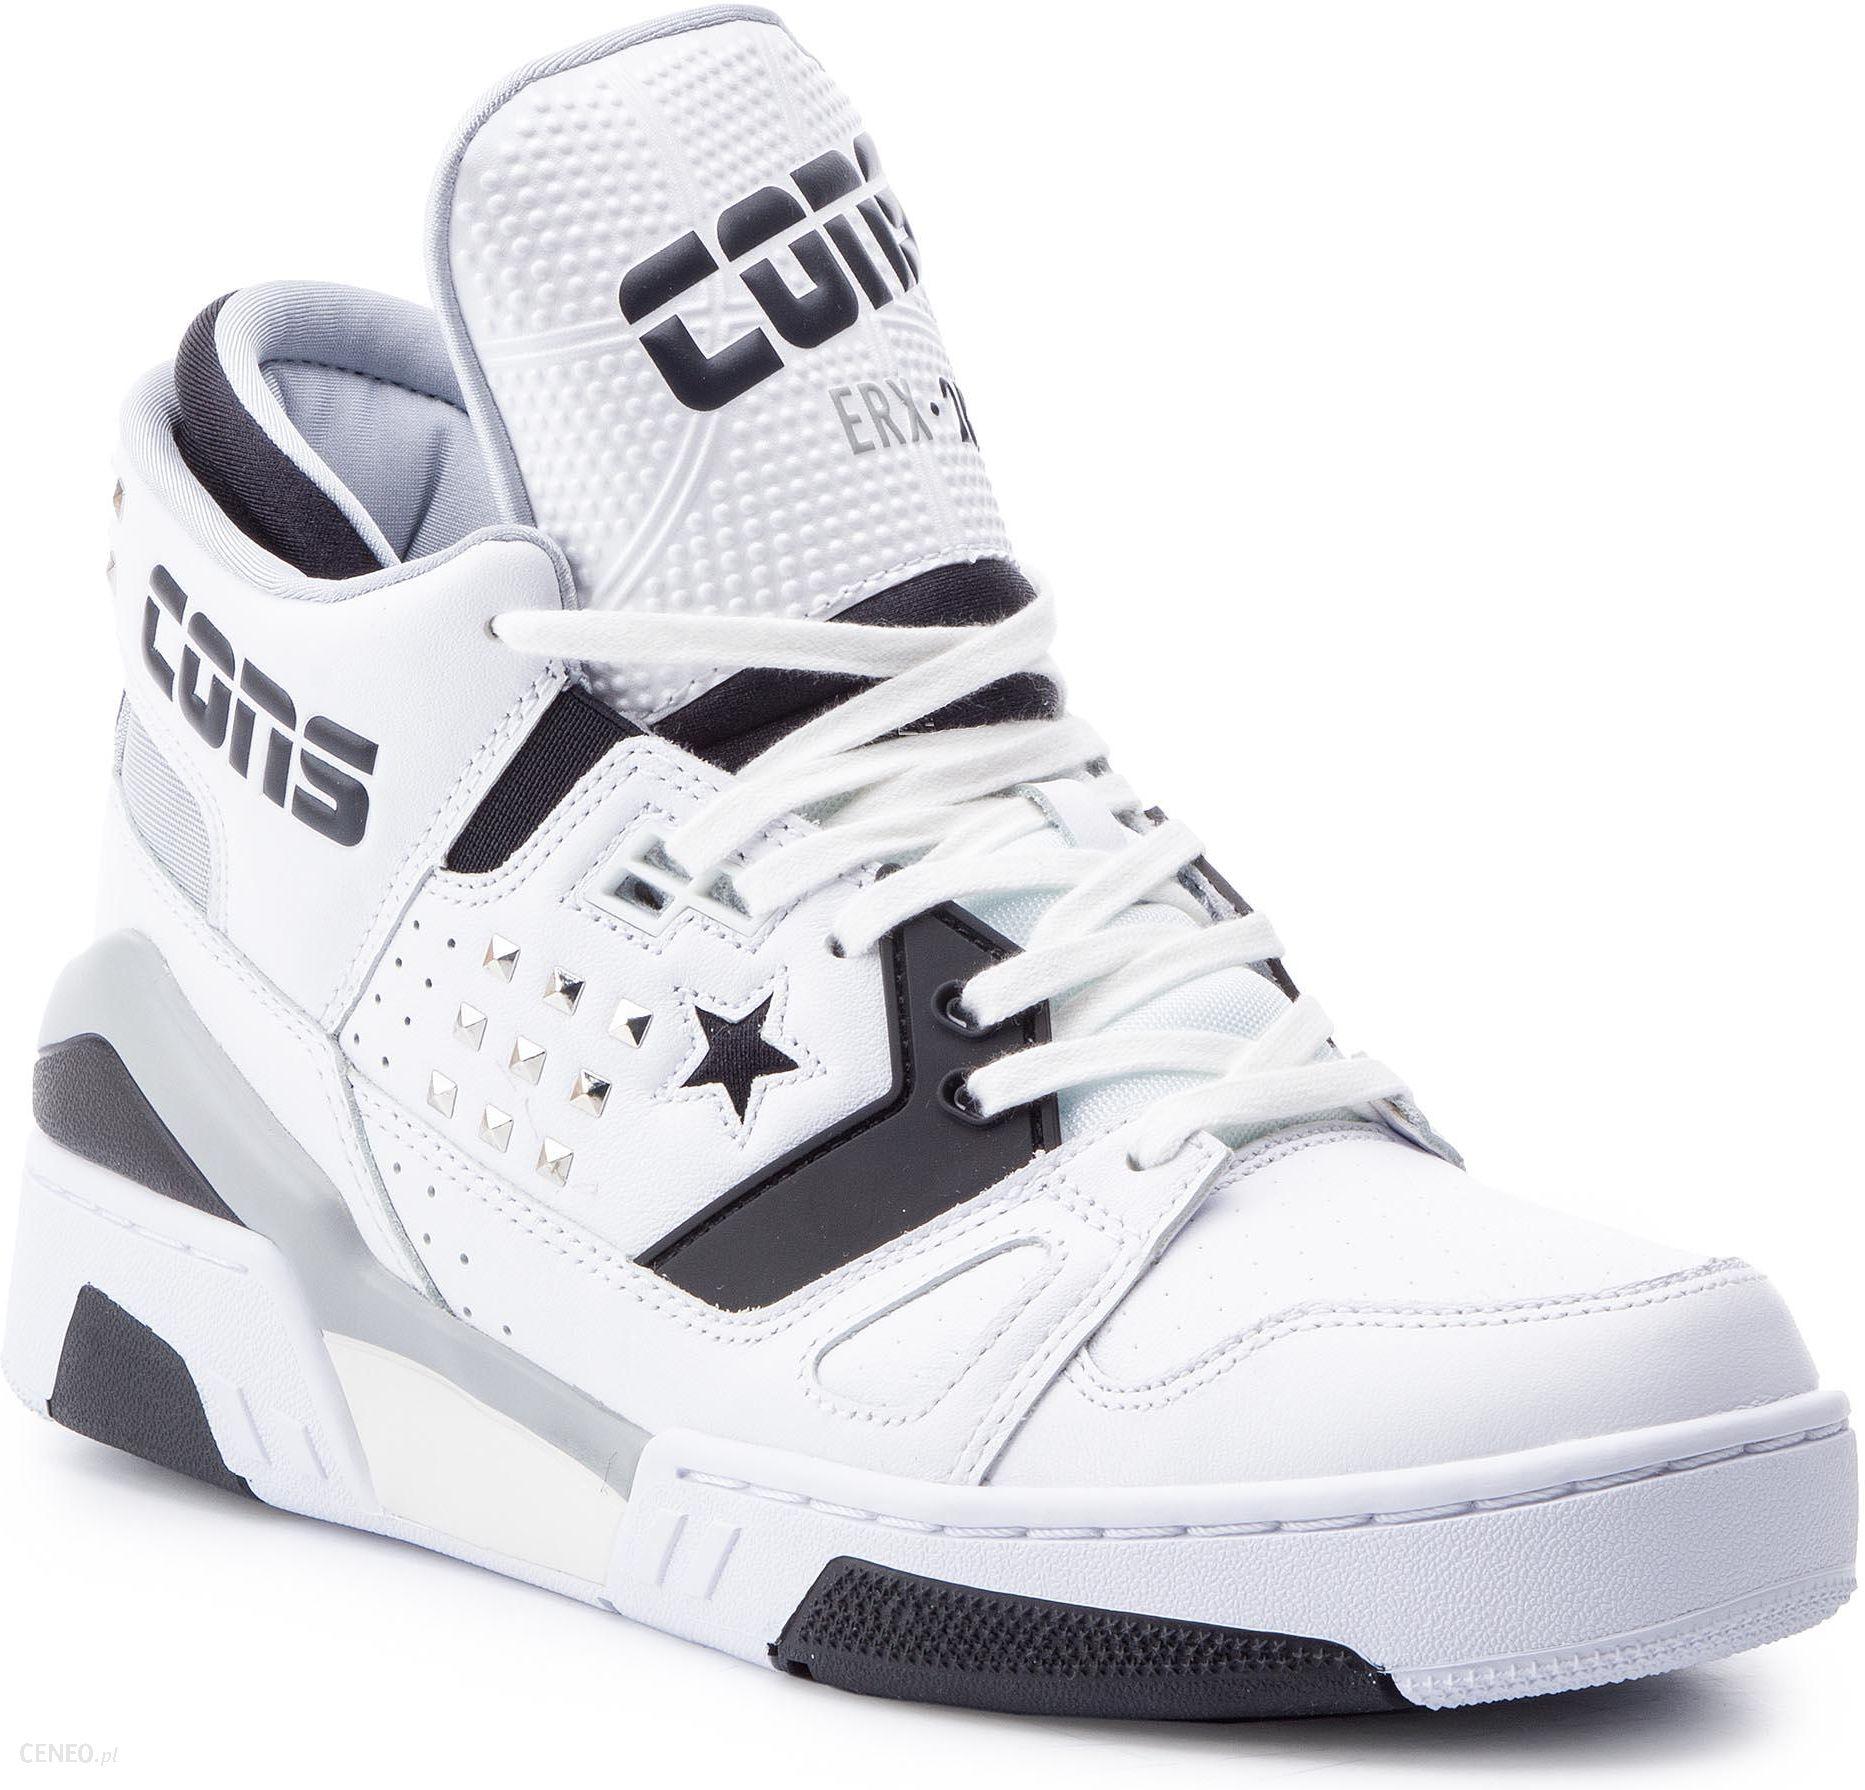 Sneakersy CONVERSE Erx 260 Mid 163799C WhiteBlackMouse Ceny i opinie Ceneo.pl